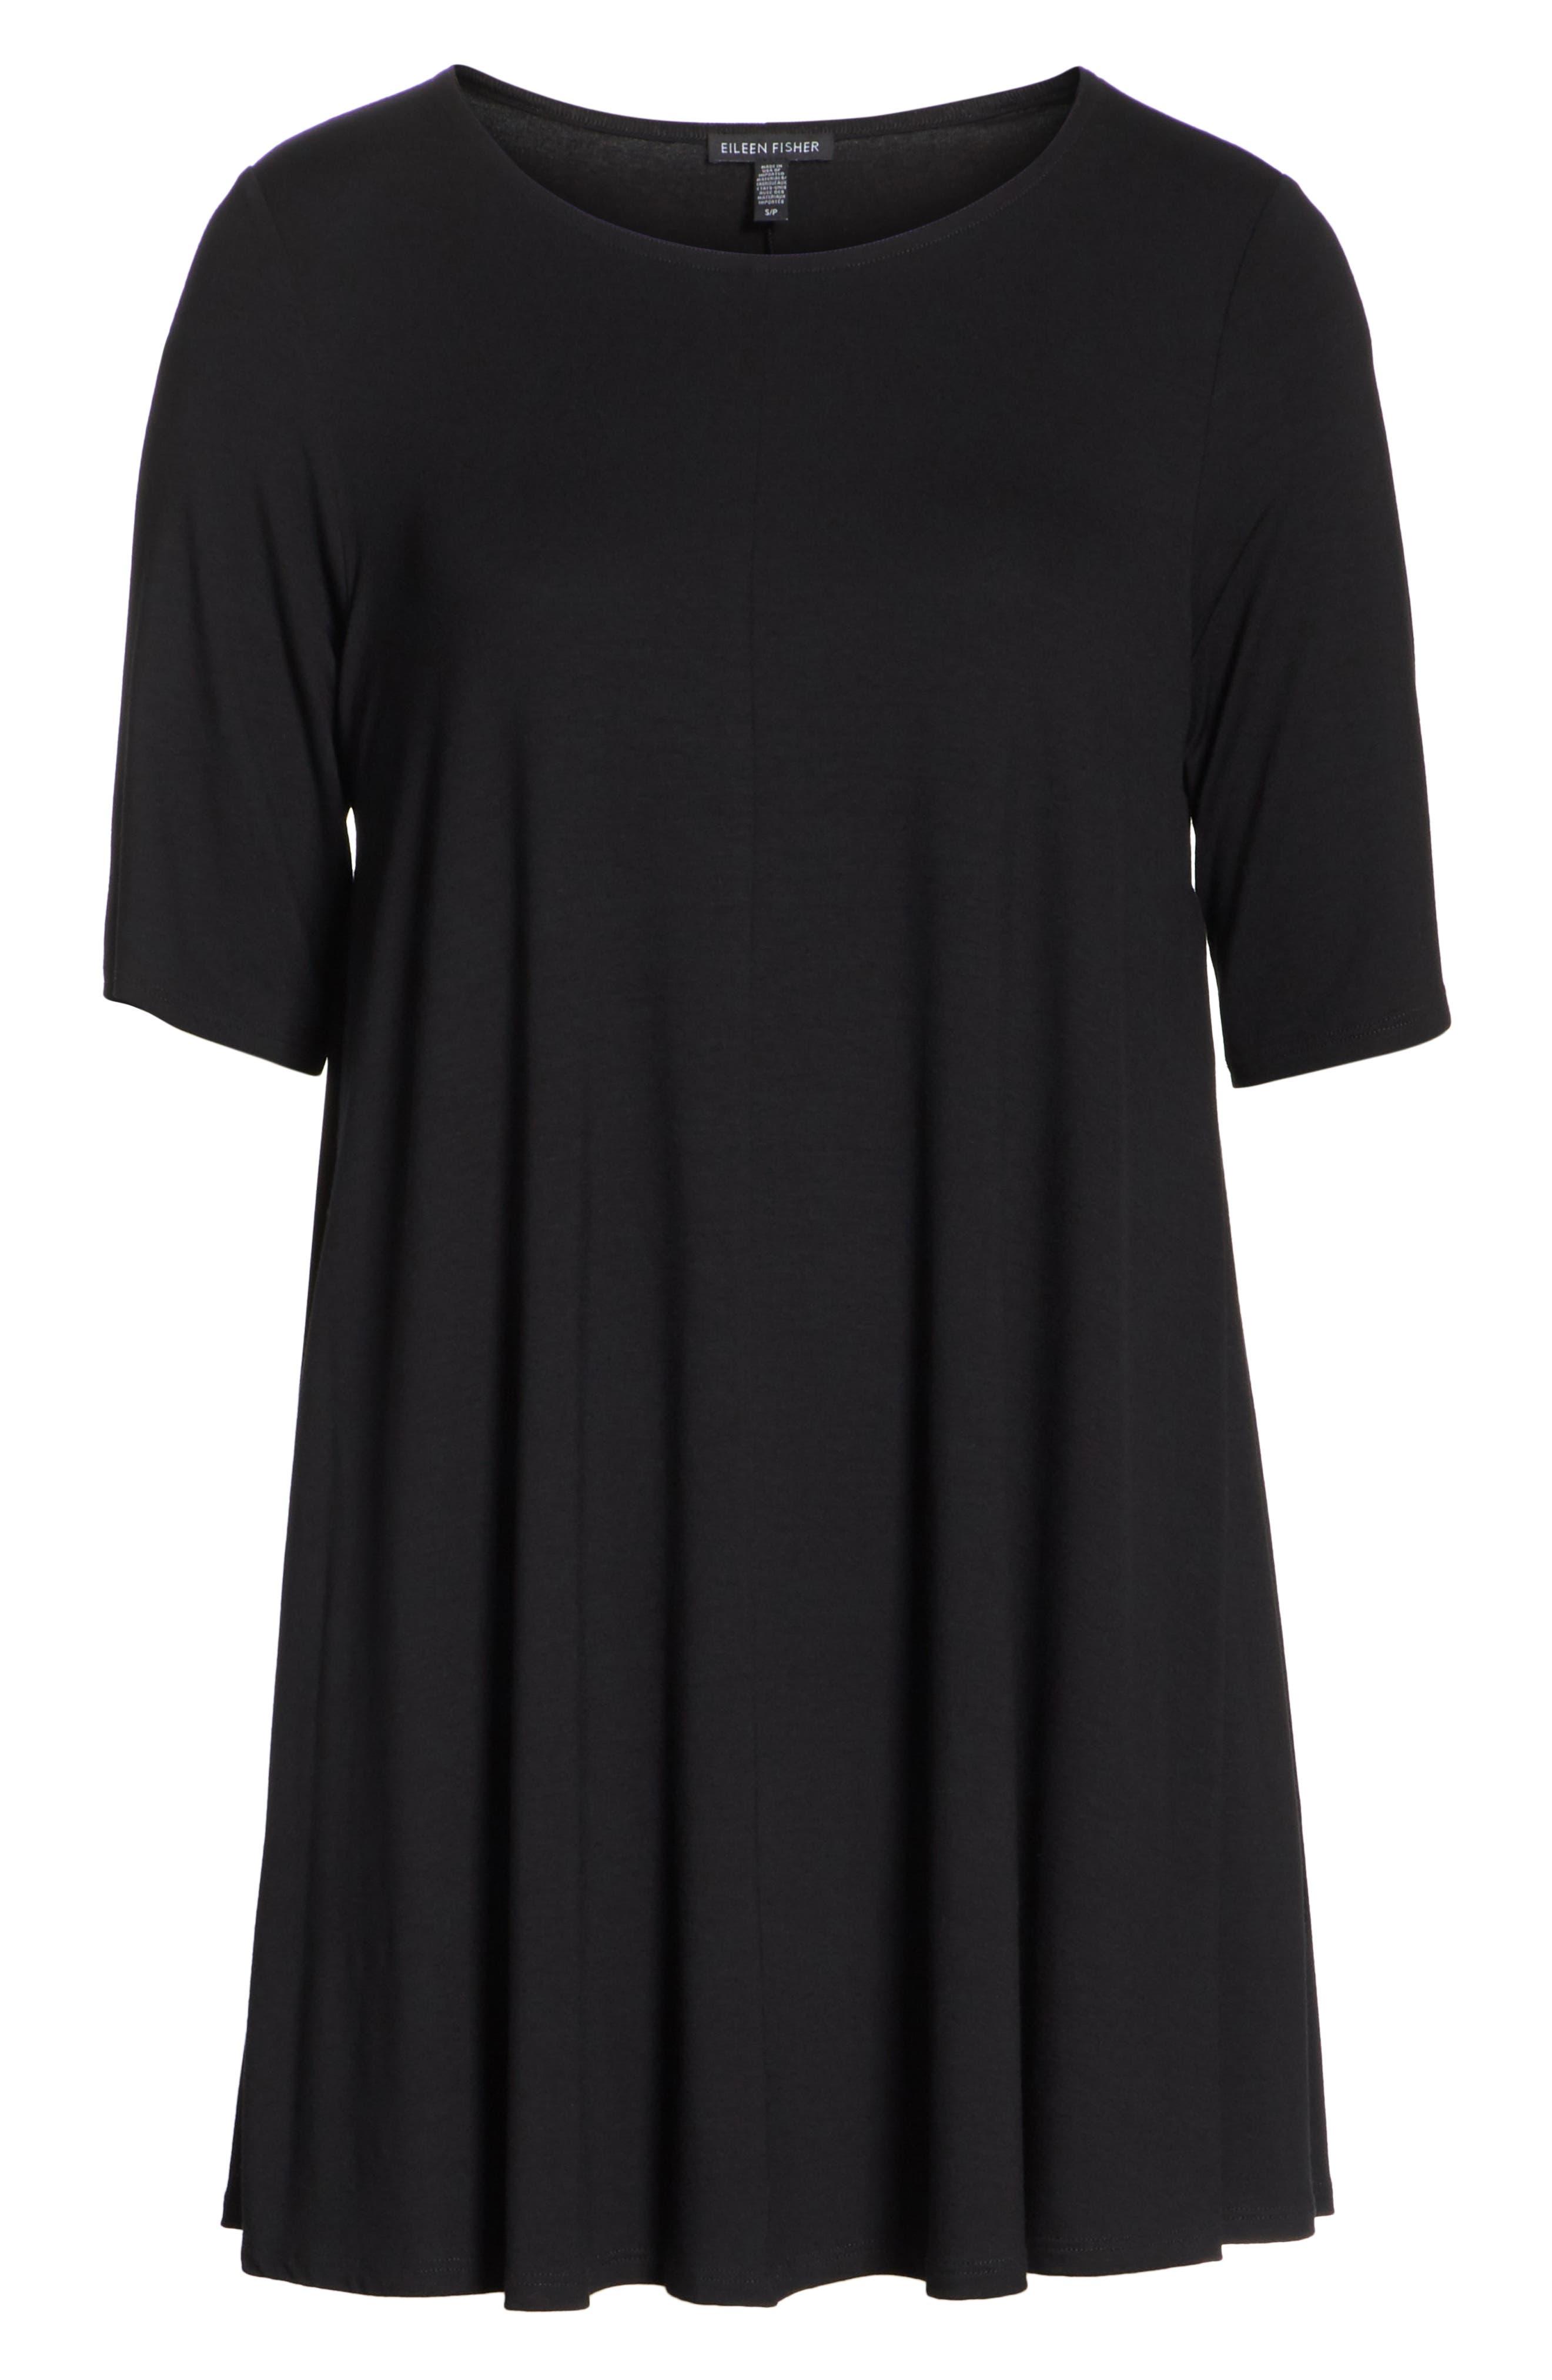 Jewel Neck Elbow Sleeve Tunic,                             Alternate thumbnail 6, color,                             Black